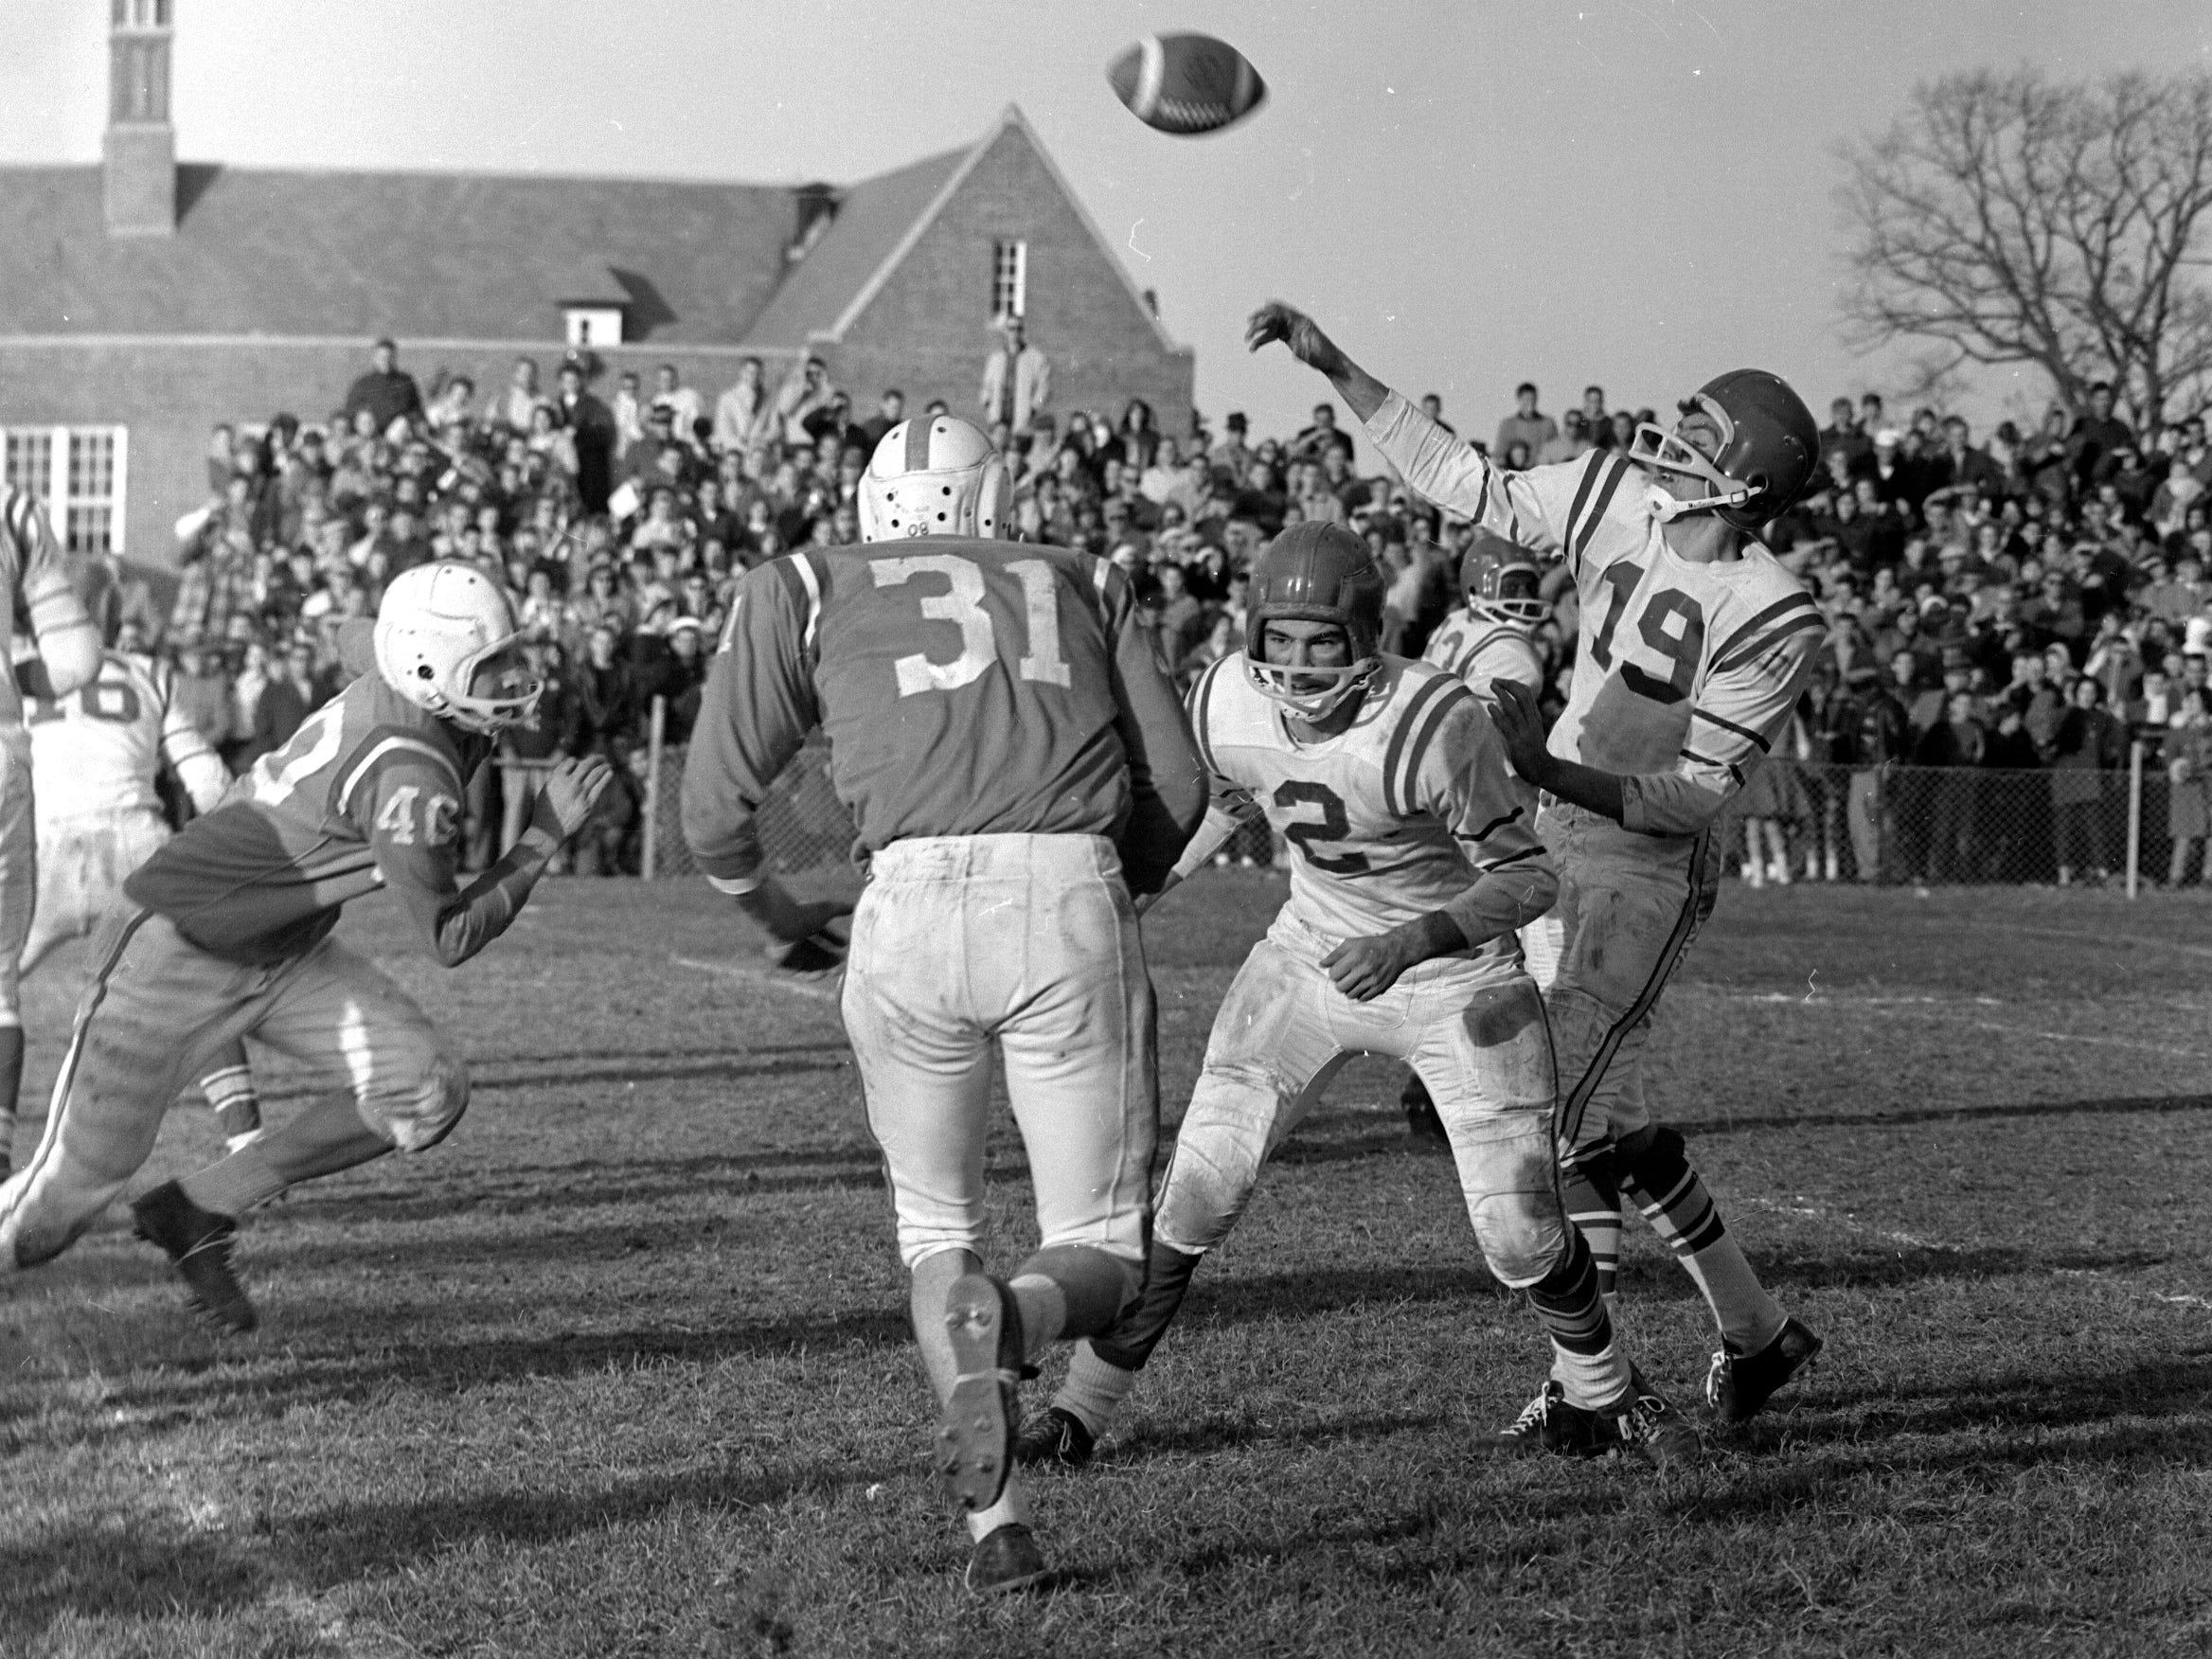 Football: Vineland vs. Millville 1960.